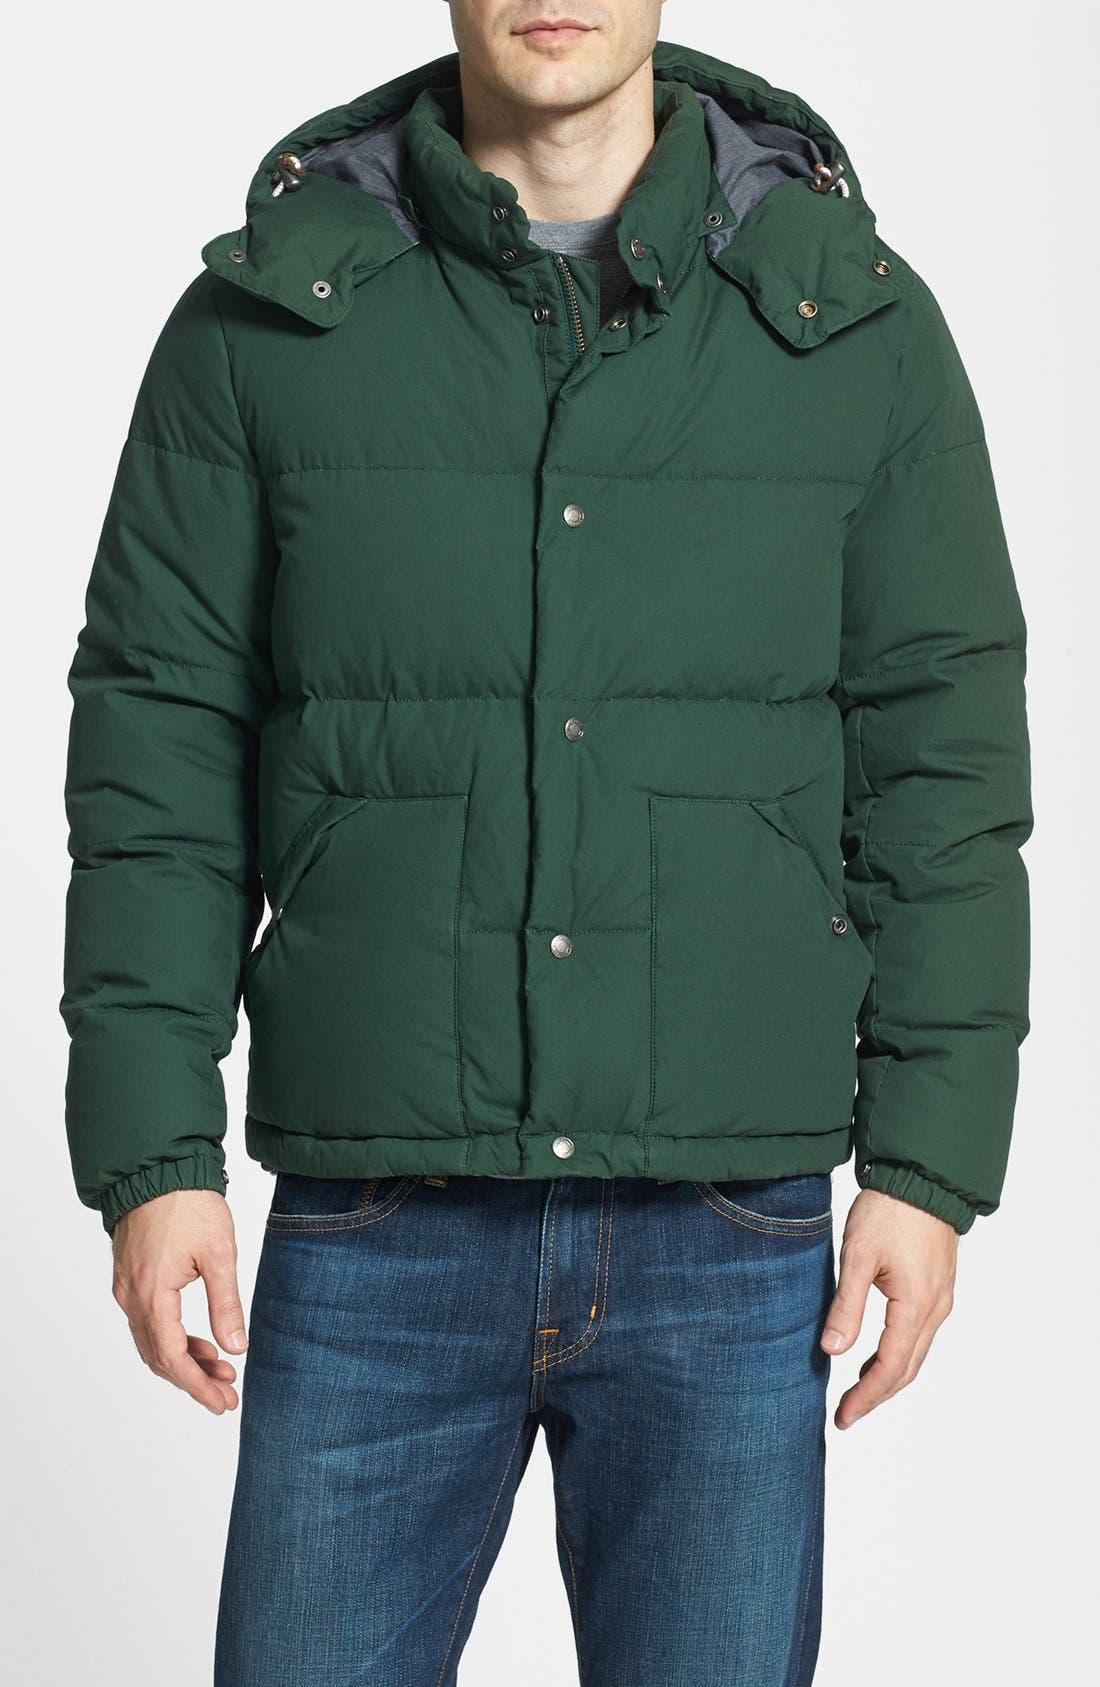 Alternate Image 1 Selected - Woolrich 'Sierra Supreme' Quilted Down Jacket